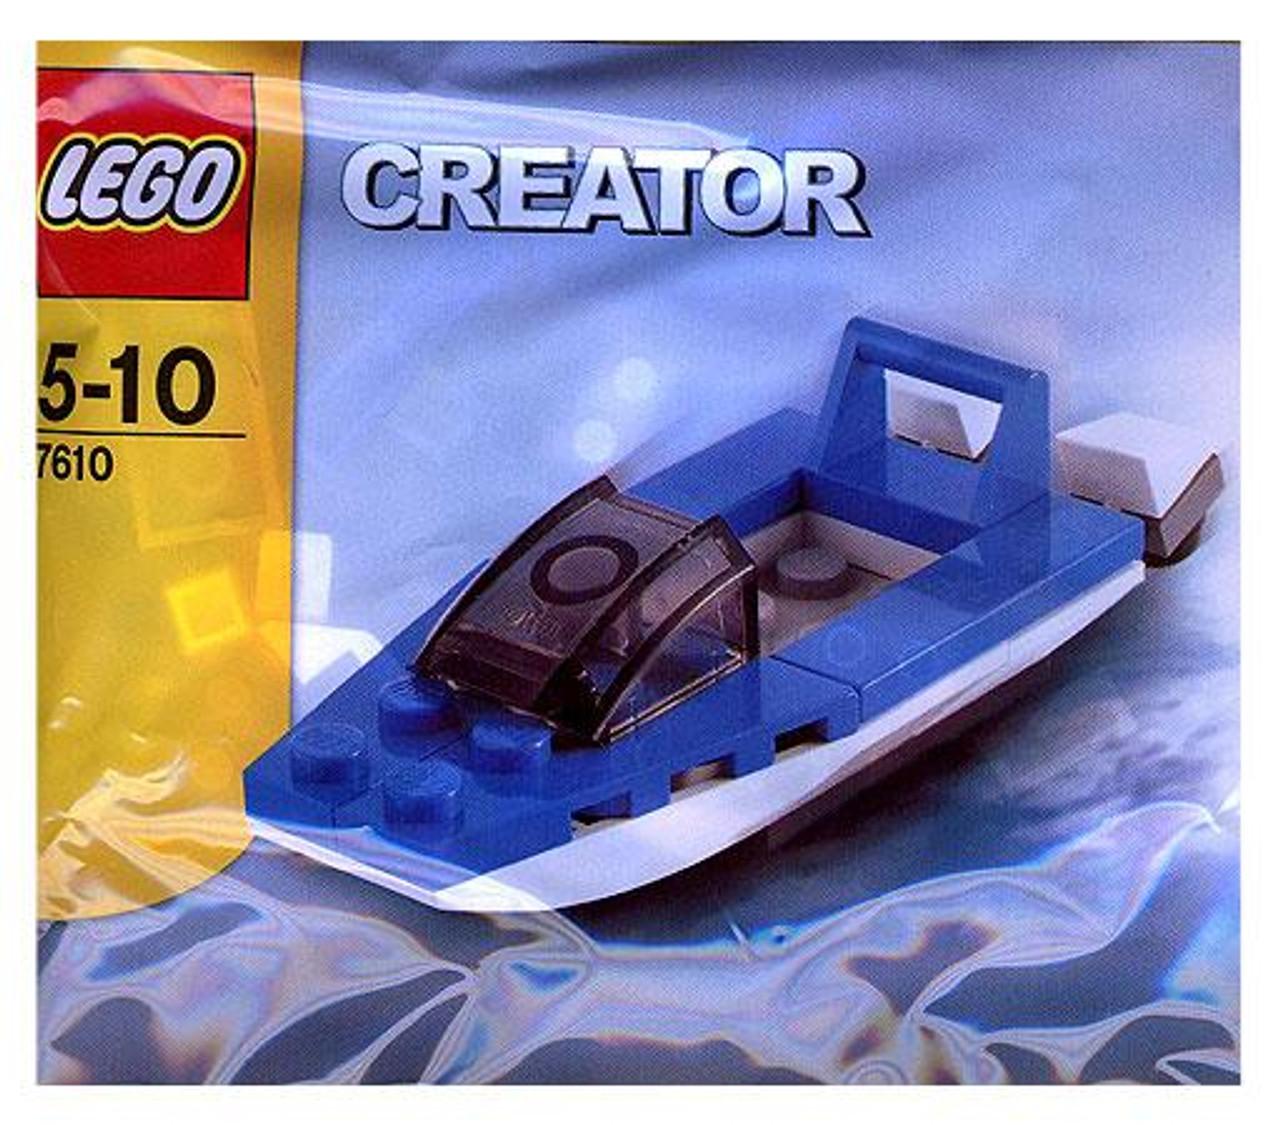 LEGO Creator Speed Boat Mini Set #7610 [Bagged]